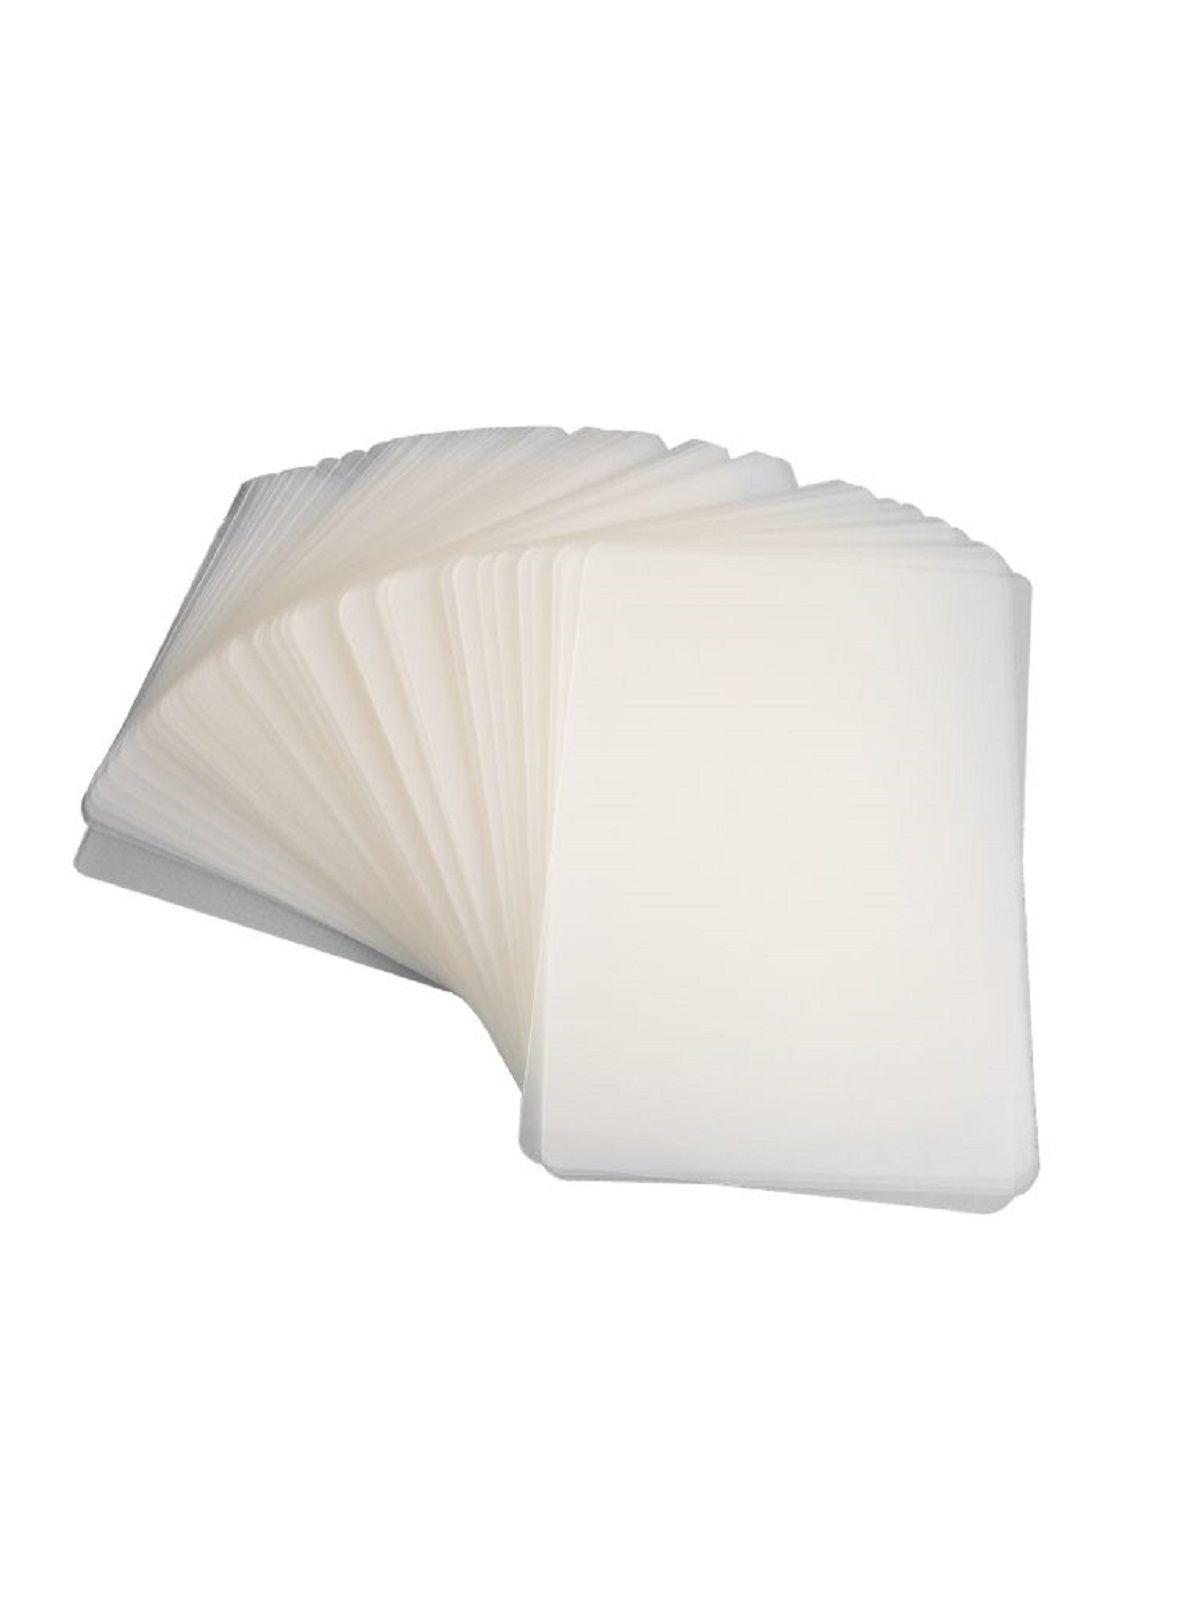 Kit 1000 Plásticos Polaseal para Plastificação CNPJ 121x191x0,10mm (250 micras)  - Click Suprimentos